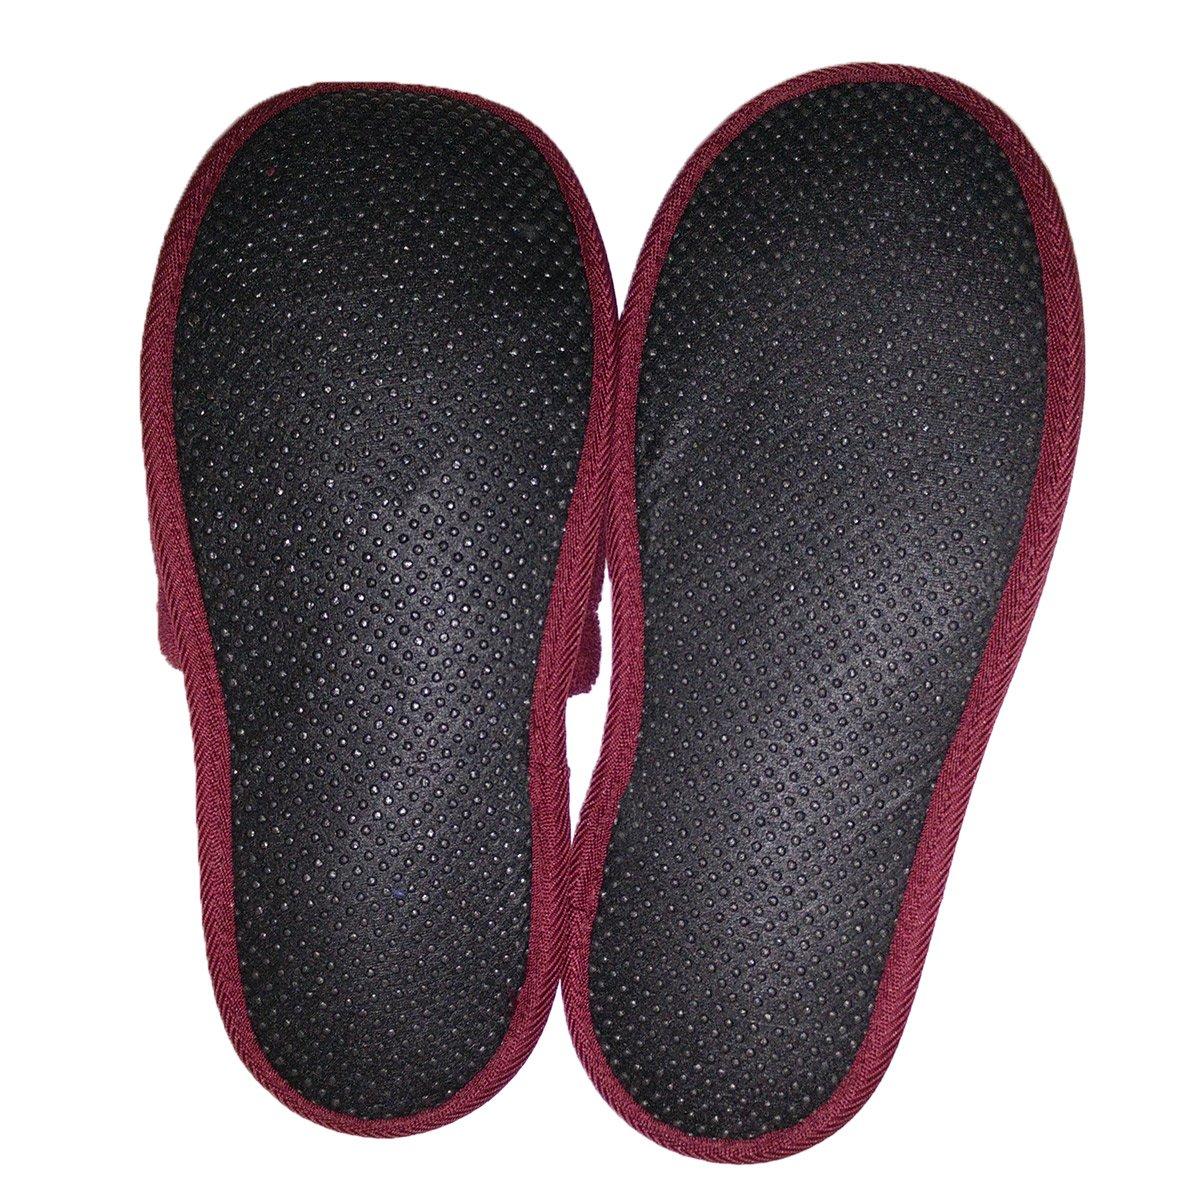 n/úmero de Zapato 43-46 100/% algod/ón Talla Unica 2 Pares Zapatillas de ba/ño de Rizo para Mujeres